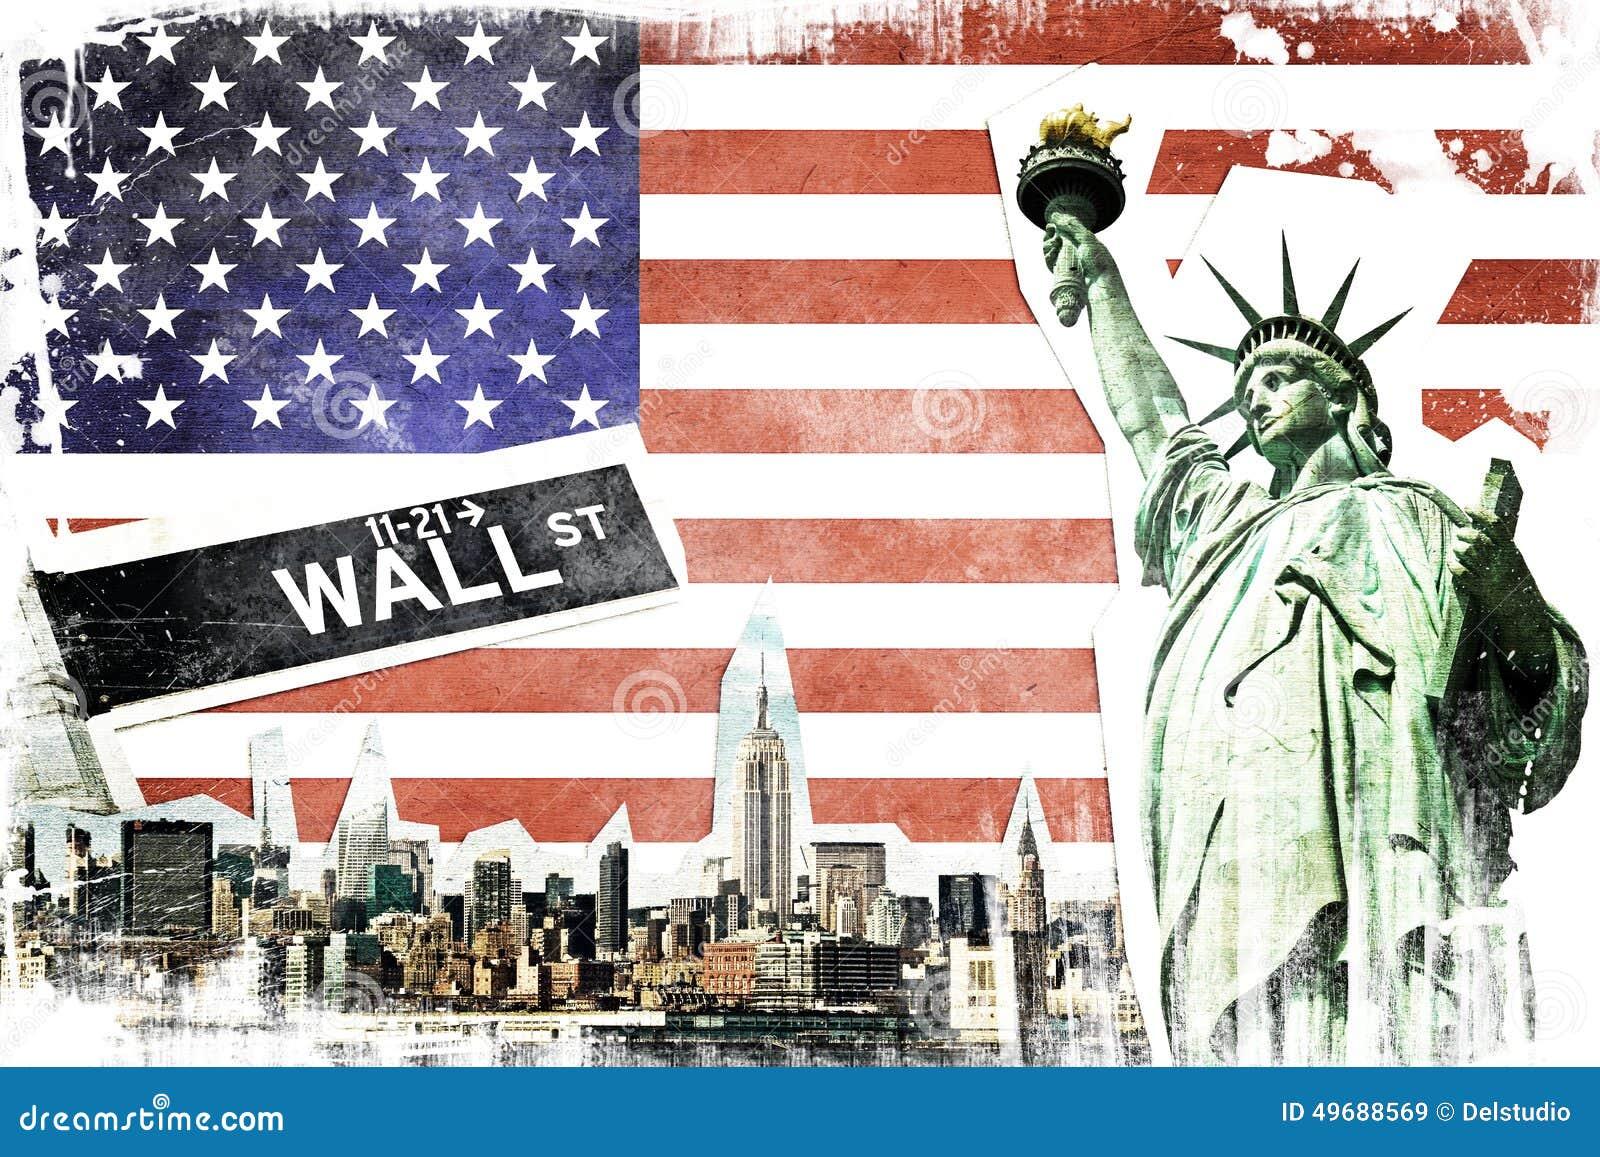 map of usa states and cities with Stock Illustration New York City Vintage Collage Us Flag Background Image49688569 on Kanada Mapa Z Nazwami Miast additionally Alexander Archipelago 6567 besides Urbanization also Libya likewise Nevada map.